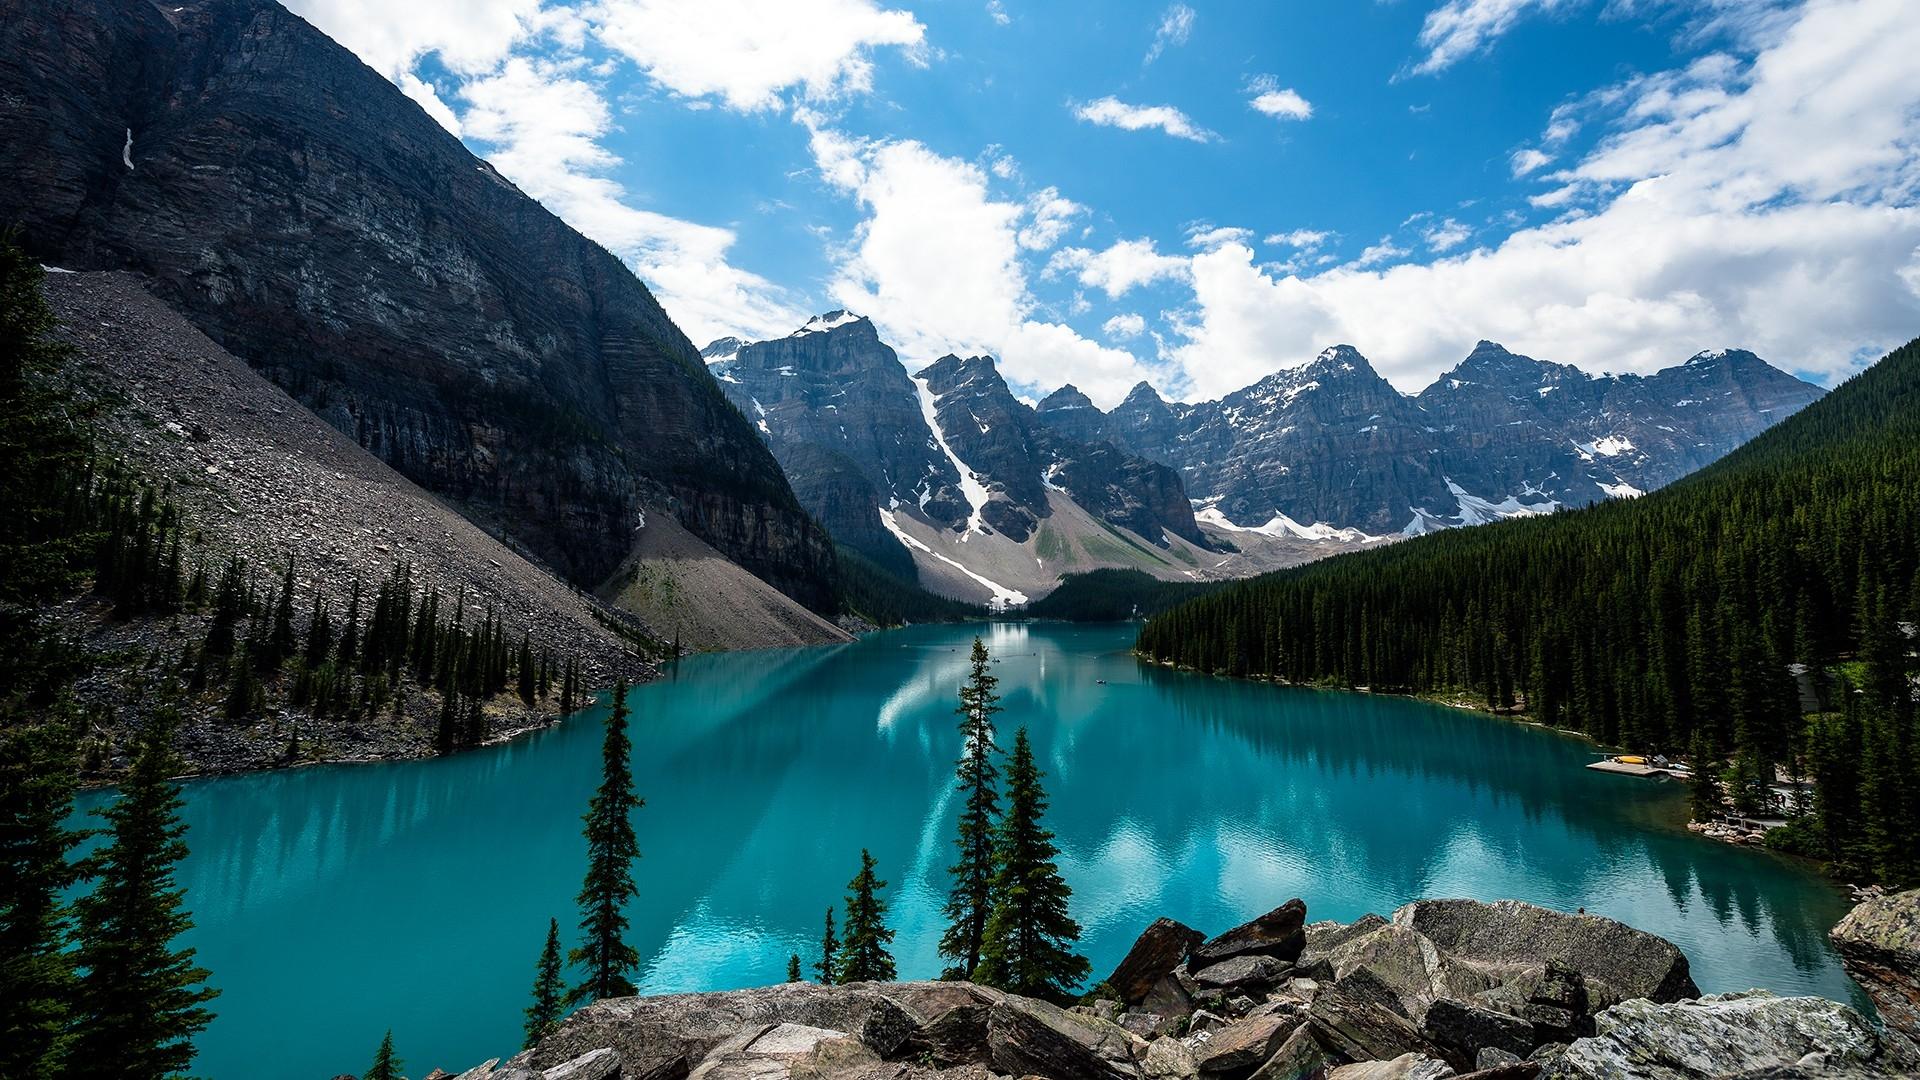 HD-desktop-backgrounds-canada-Canada-Best-in-HD-desktop-backgrounds-canada-wallpaper-wpc5805731